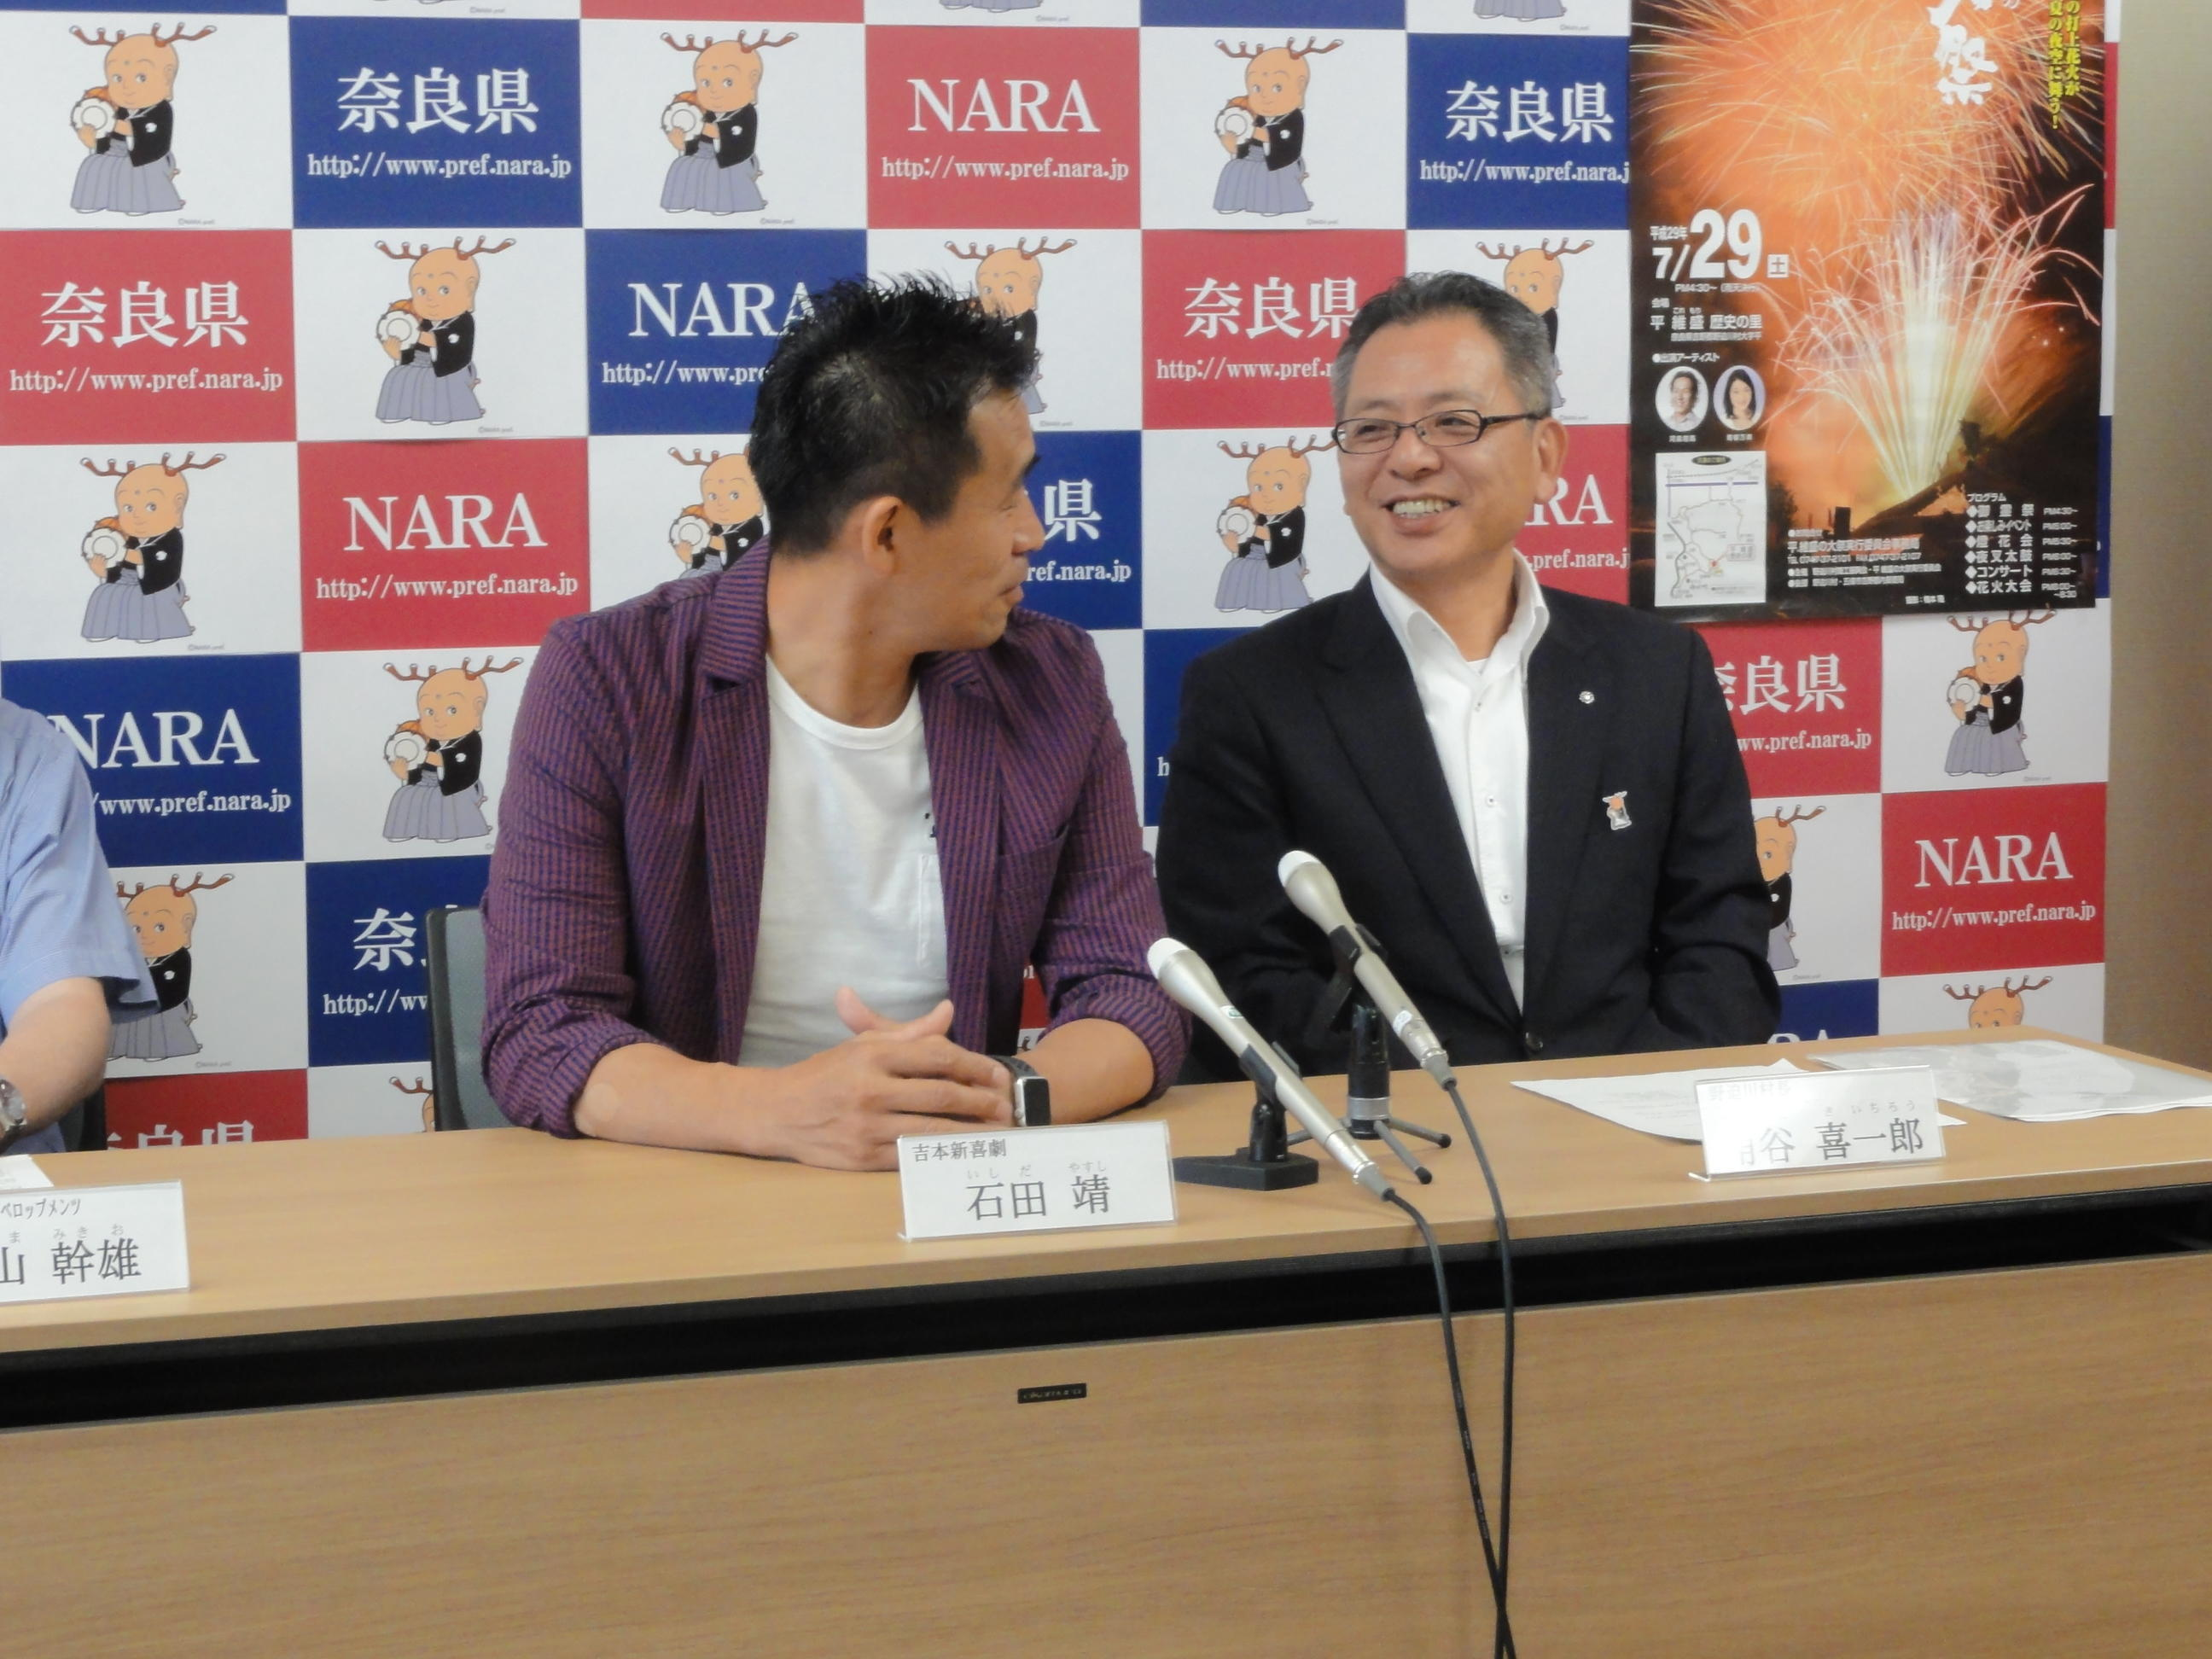 http://news.yoshimoto.co.jp/20170727212010-1f4dd4348076ff13d2c9e6daa7f3e7d81def5e6e.jpg